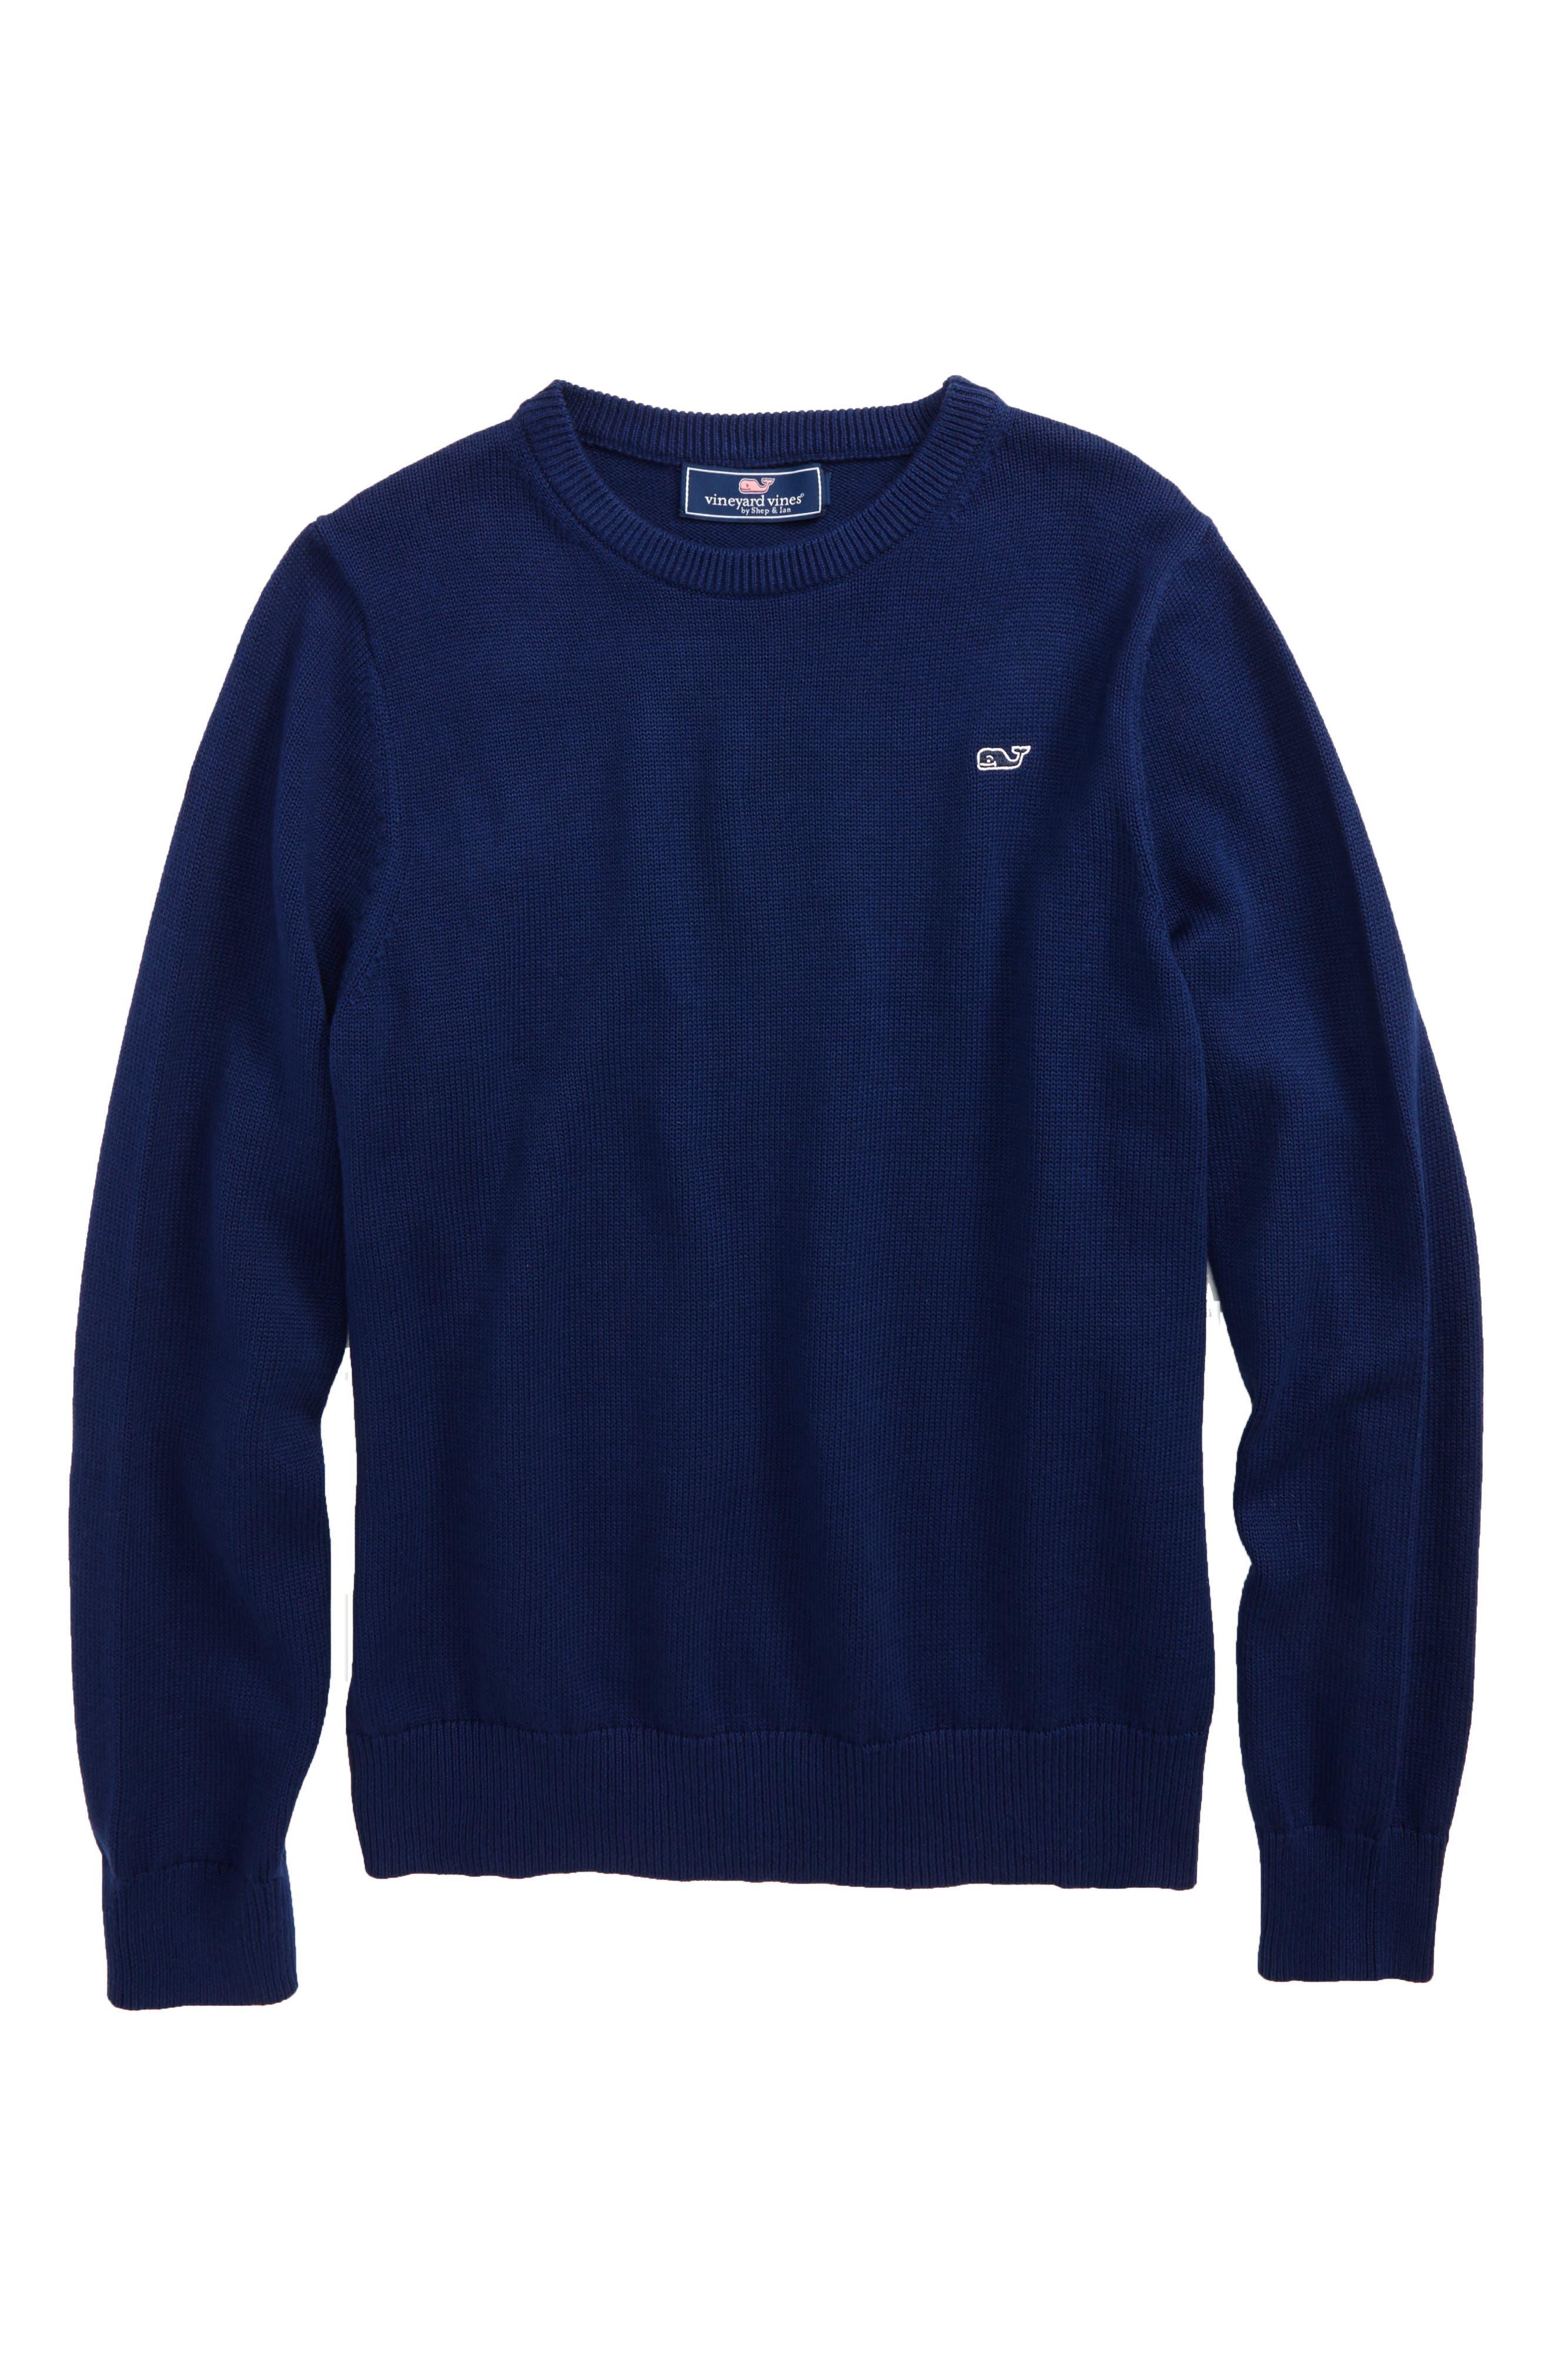 Vineyard Vines Classic Crewneck Sweater (Big Boys)